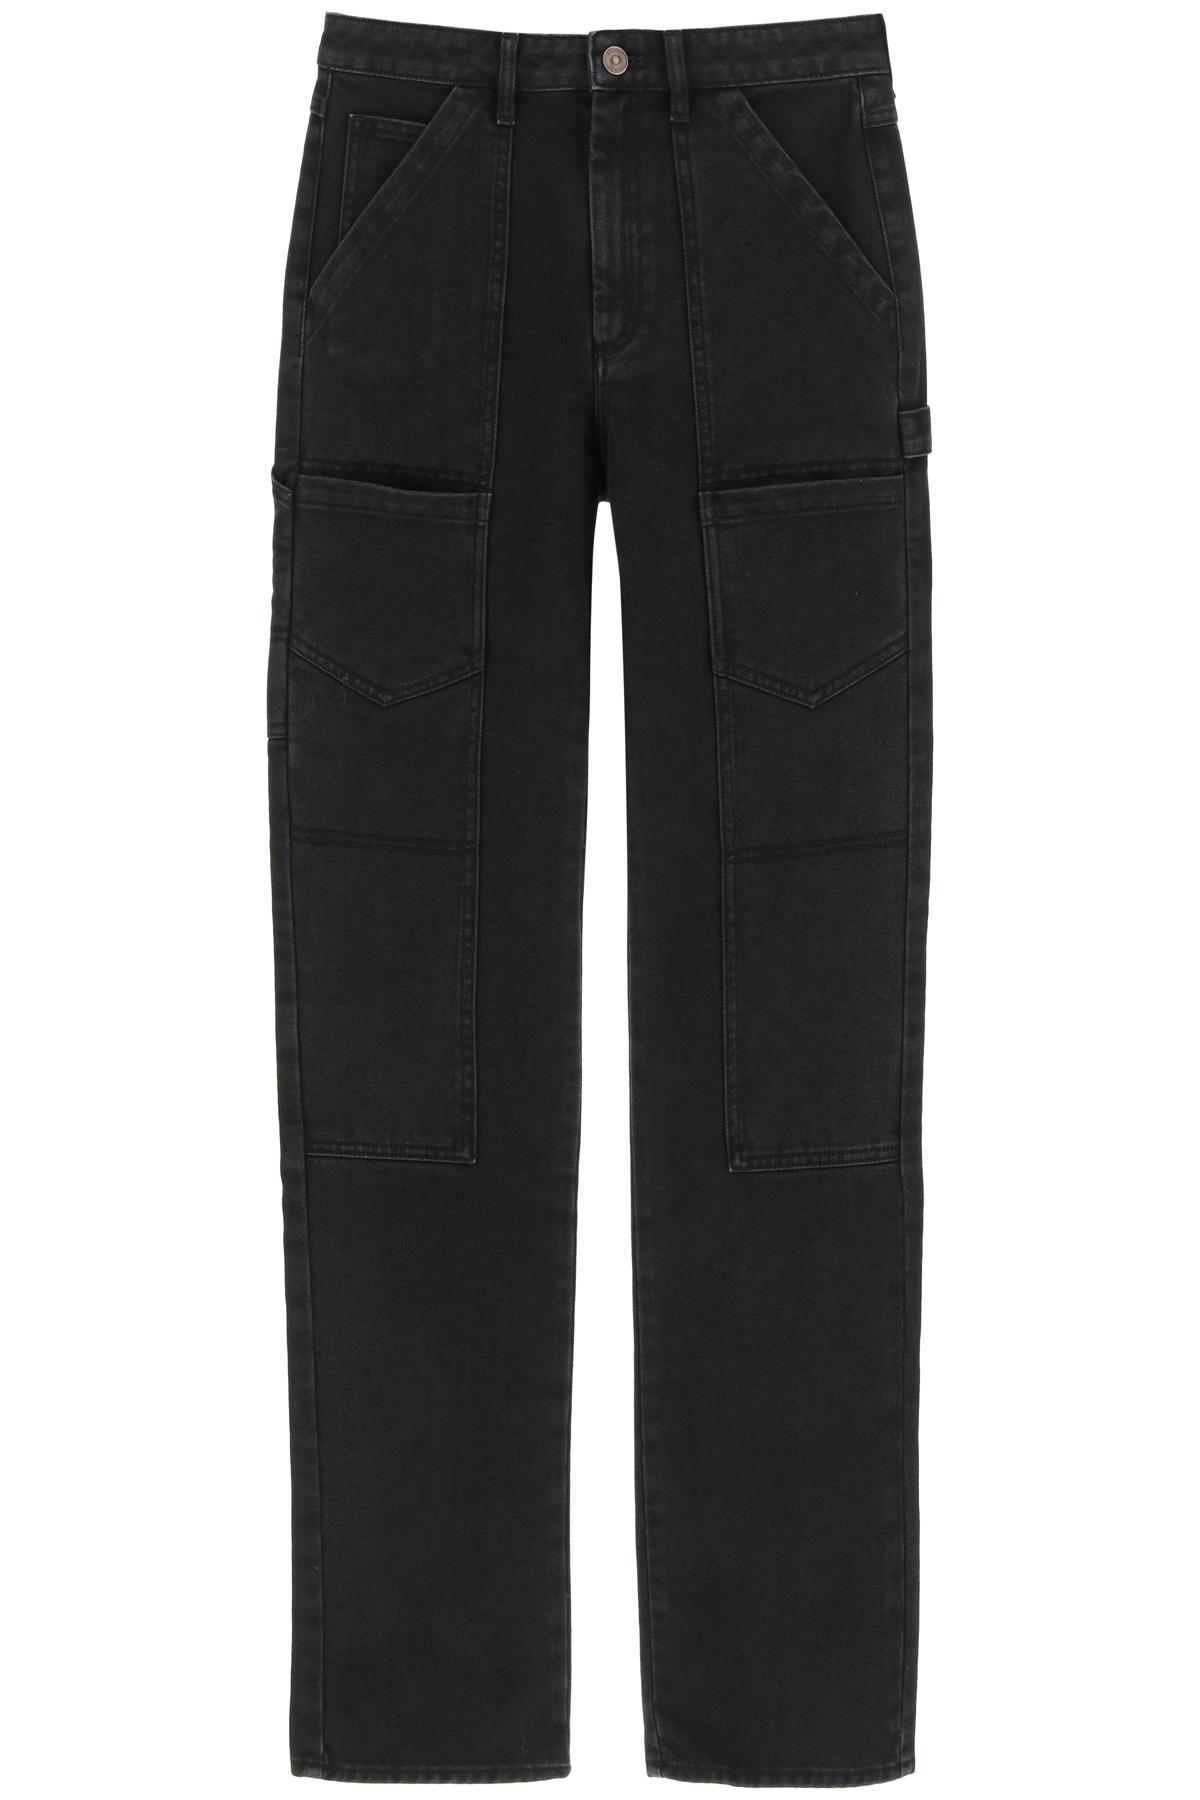 Kenzo jeans a vita alta